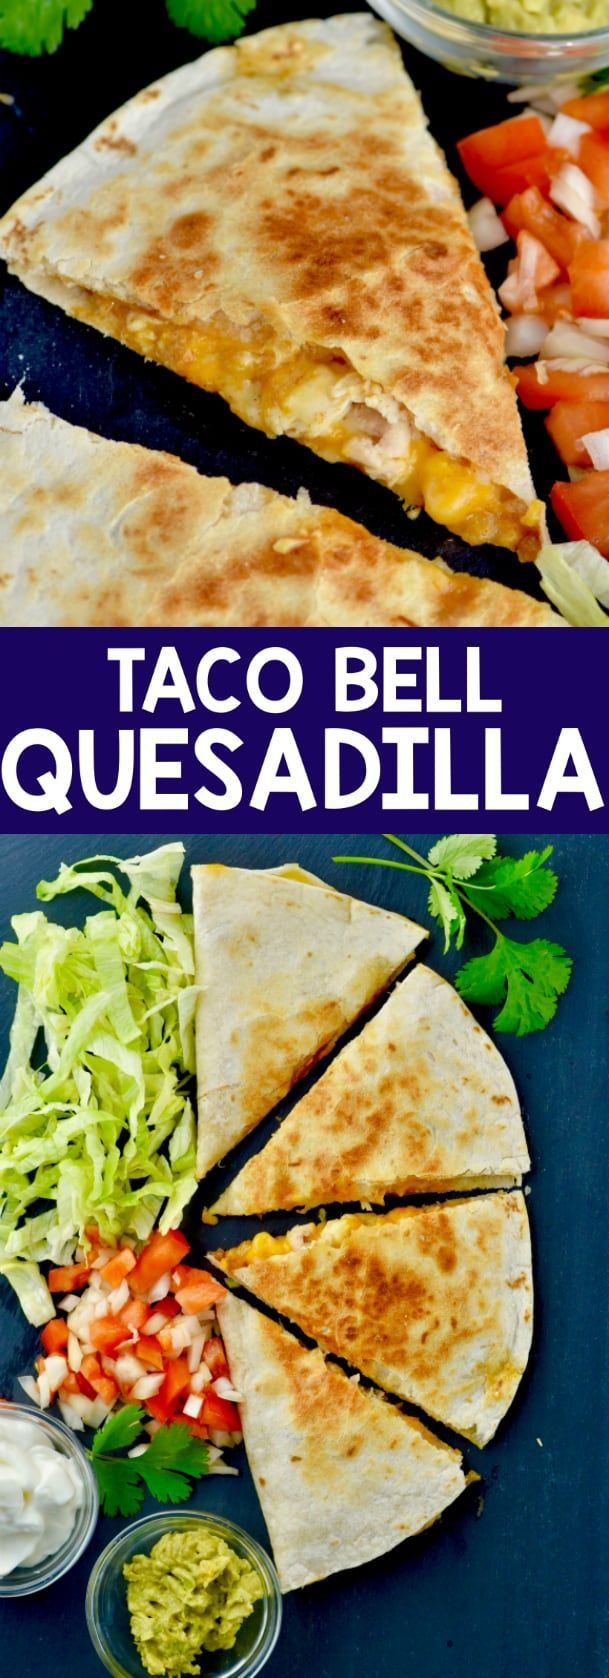 Make This Copycat Taco Bell Chicken Quesadilla Recipe -1228